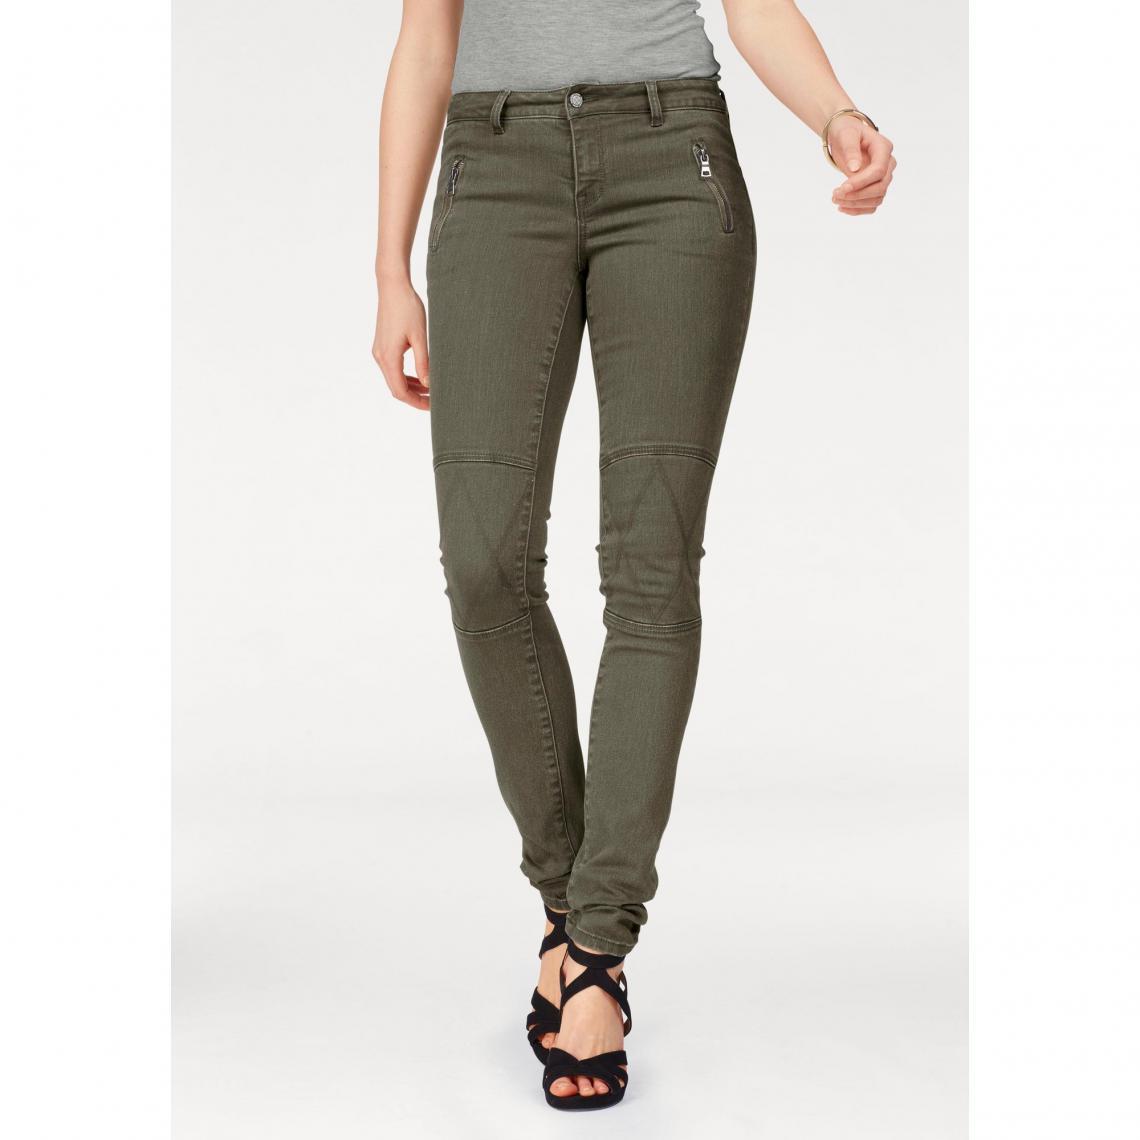 Pantalon slim zippé avec empiècements femme Laura Scott - Kaki Laura Scott  Femme a3239d5e8749